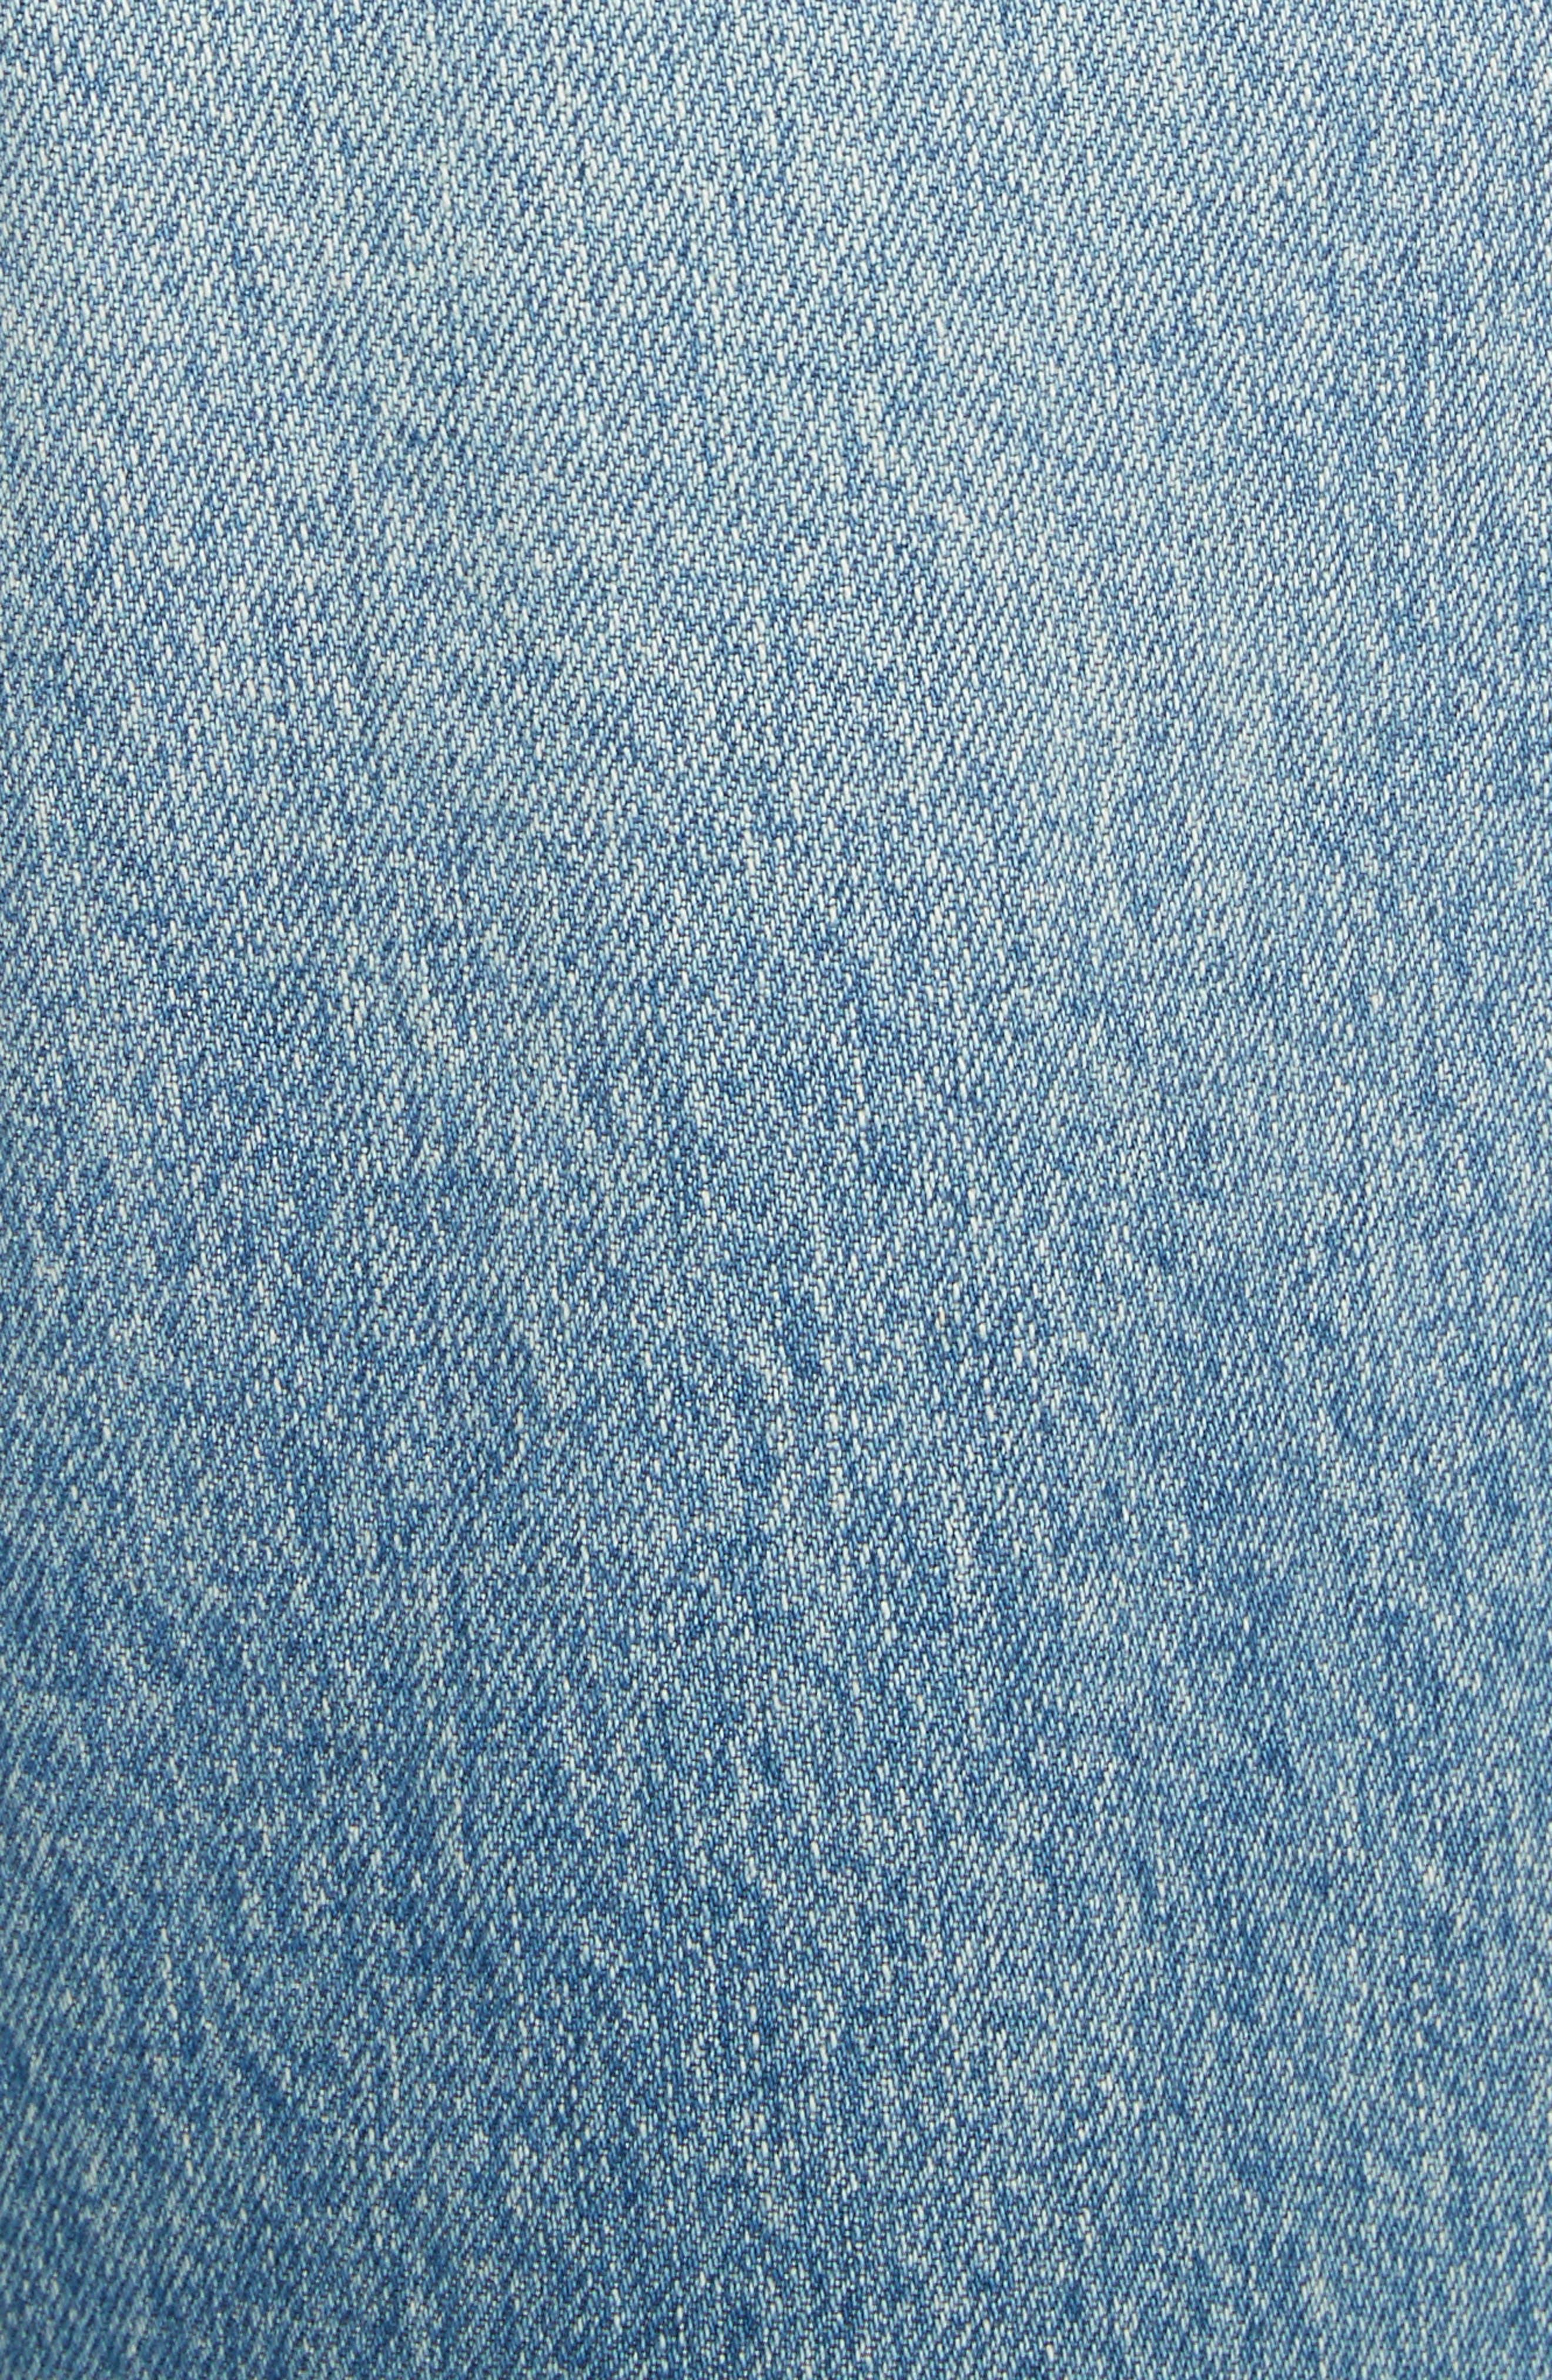 Shifted Zip Crop Wide Leg Jeans,                             Alternate thumbnail 5, color,                             Blue